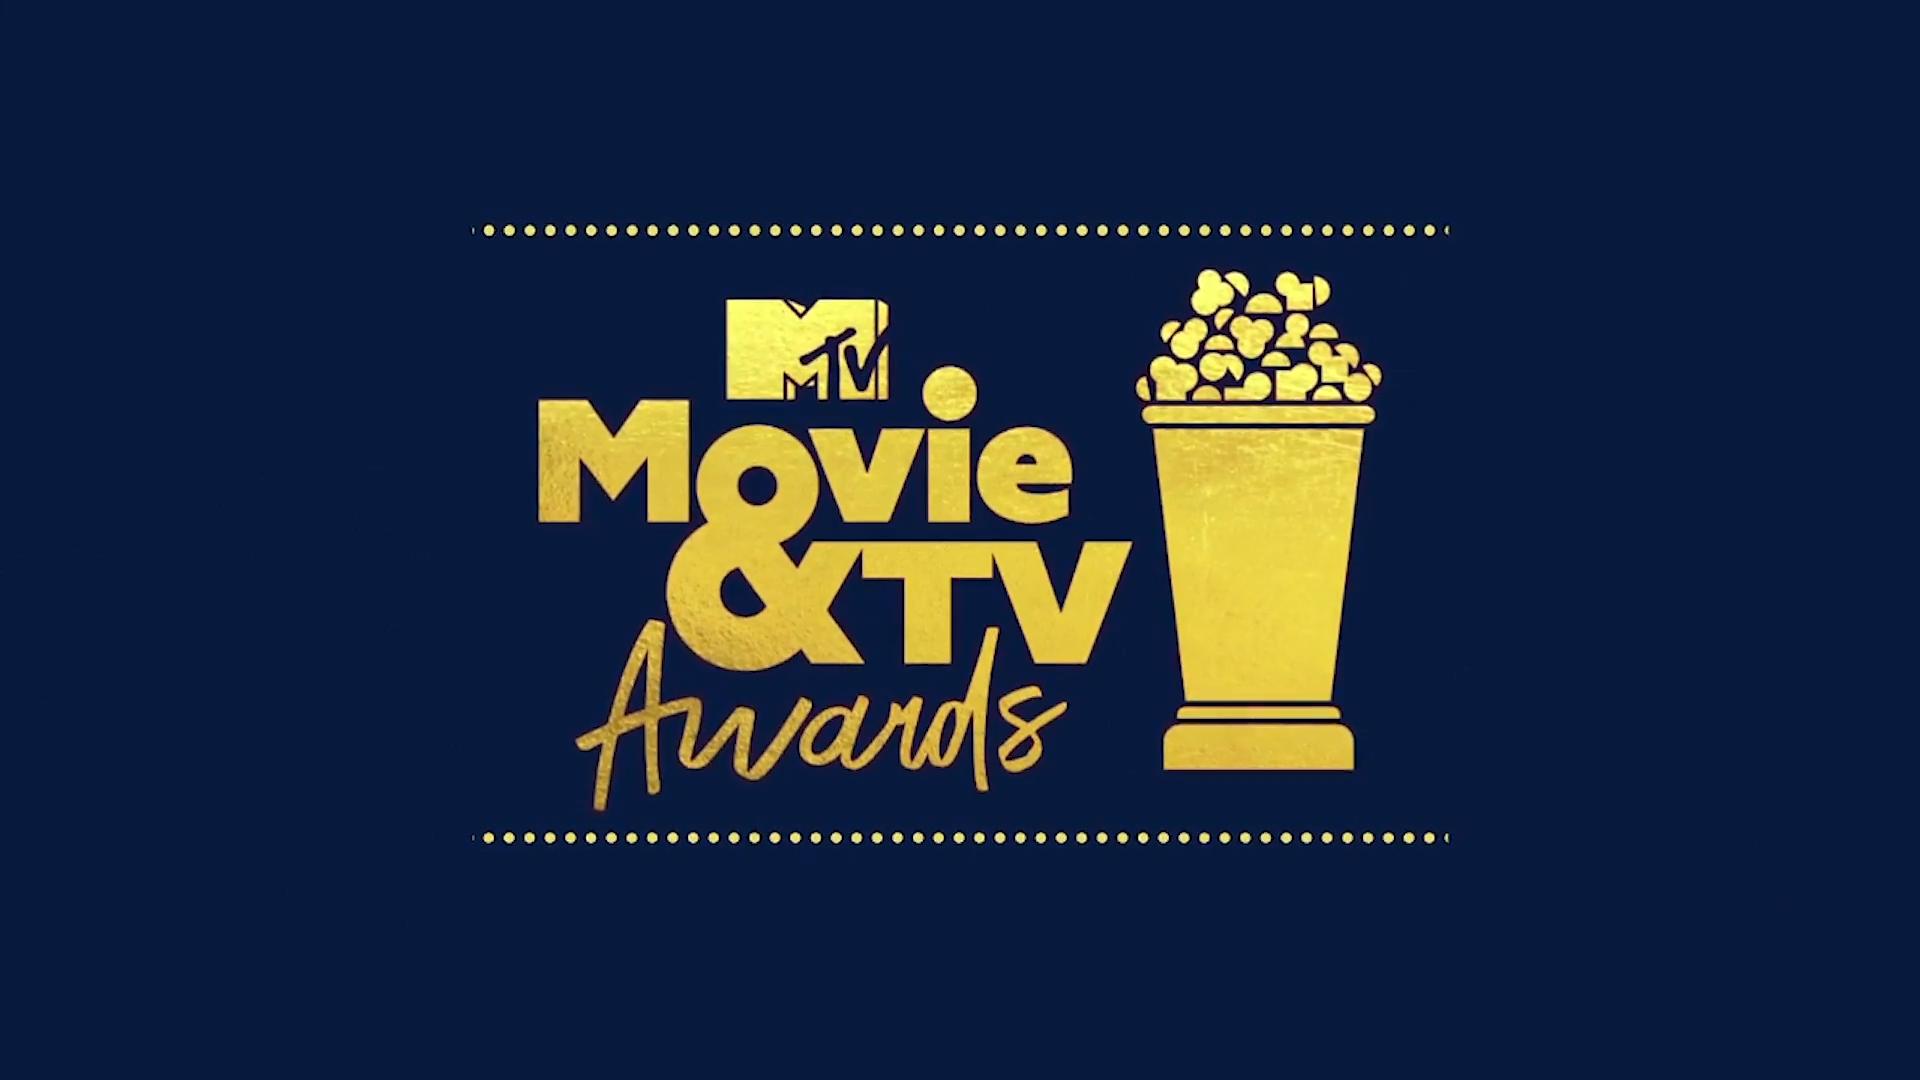 'MTV Movies and TV Awards' Batal Digelar Bulan Ini, Jadi Kapan Yah?